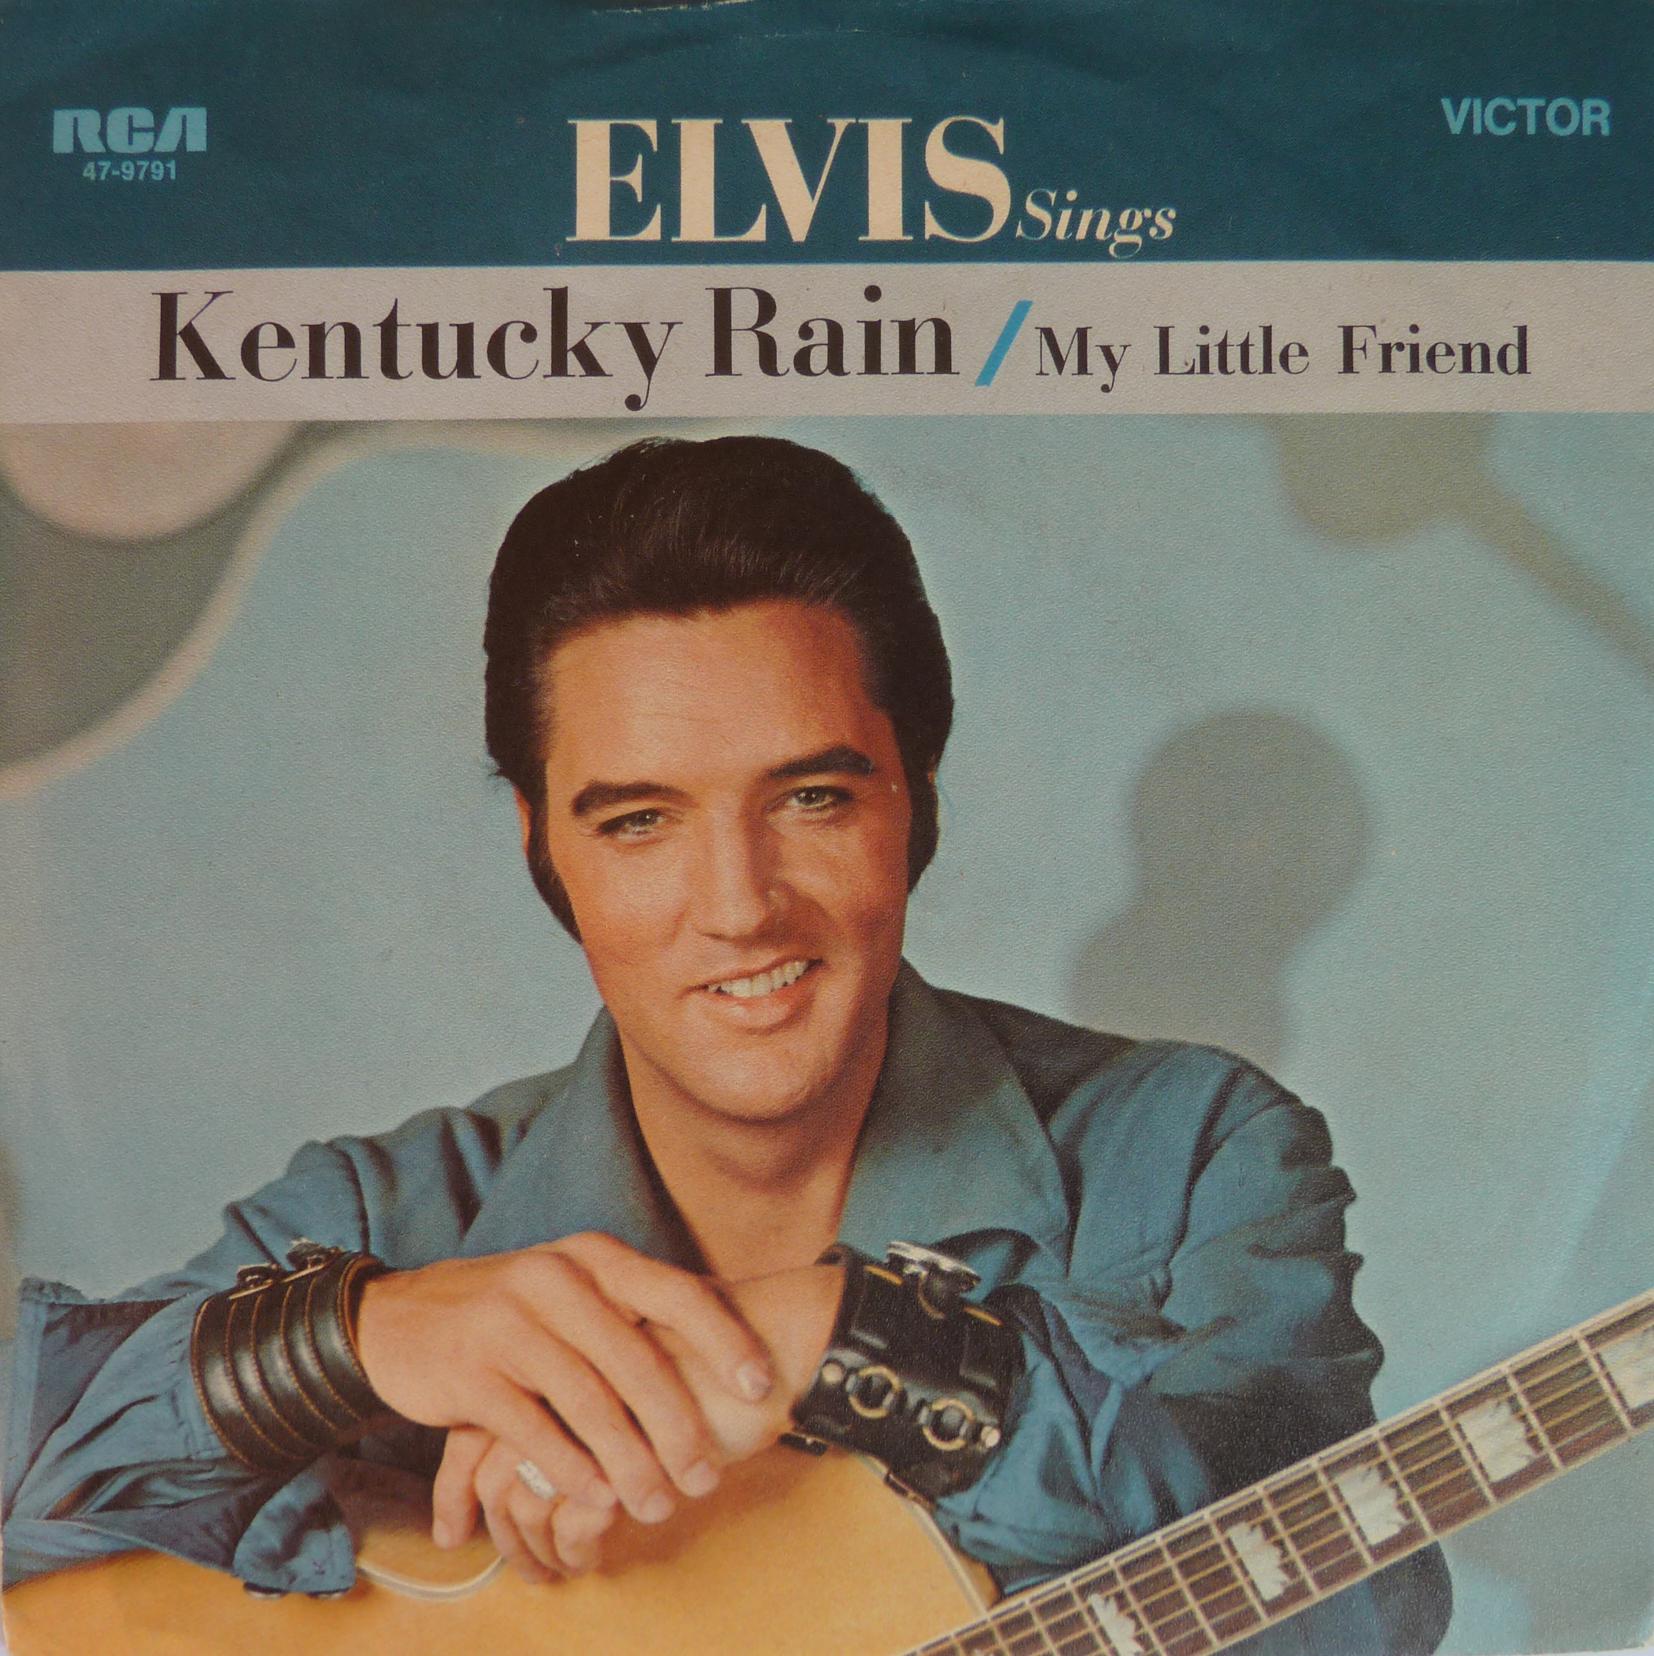 Kentucky Rain / My Little Friend Kentuckyraino1frontillq3